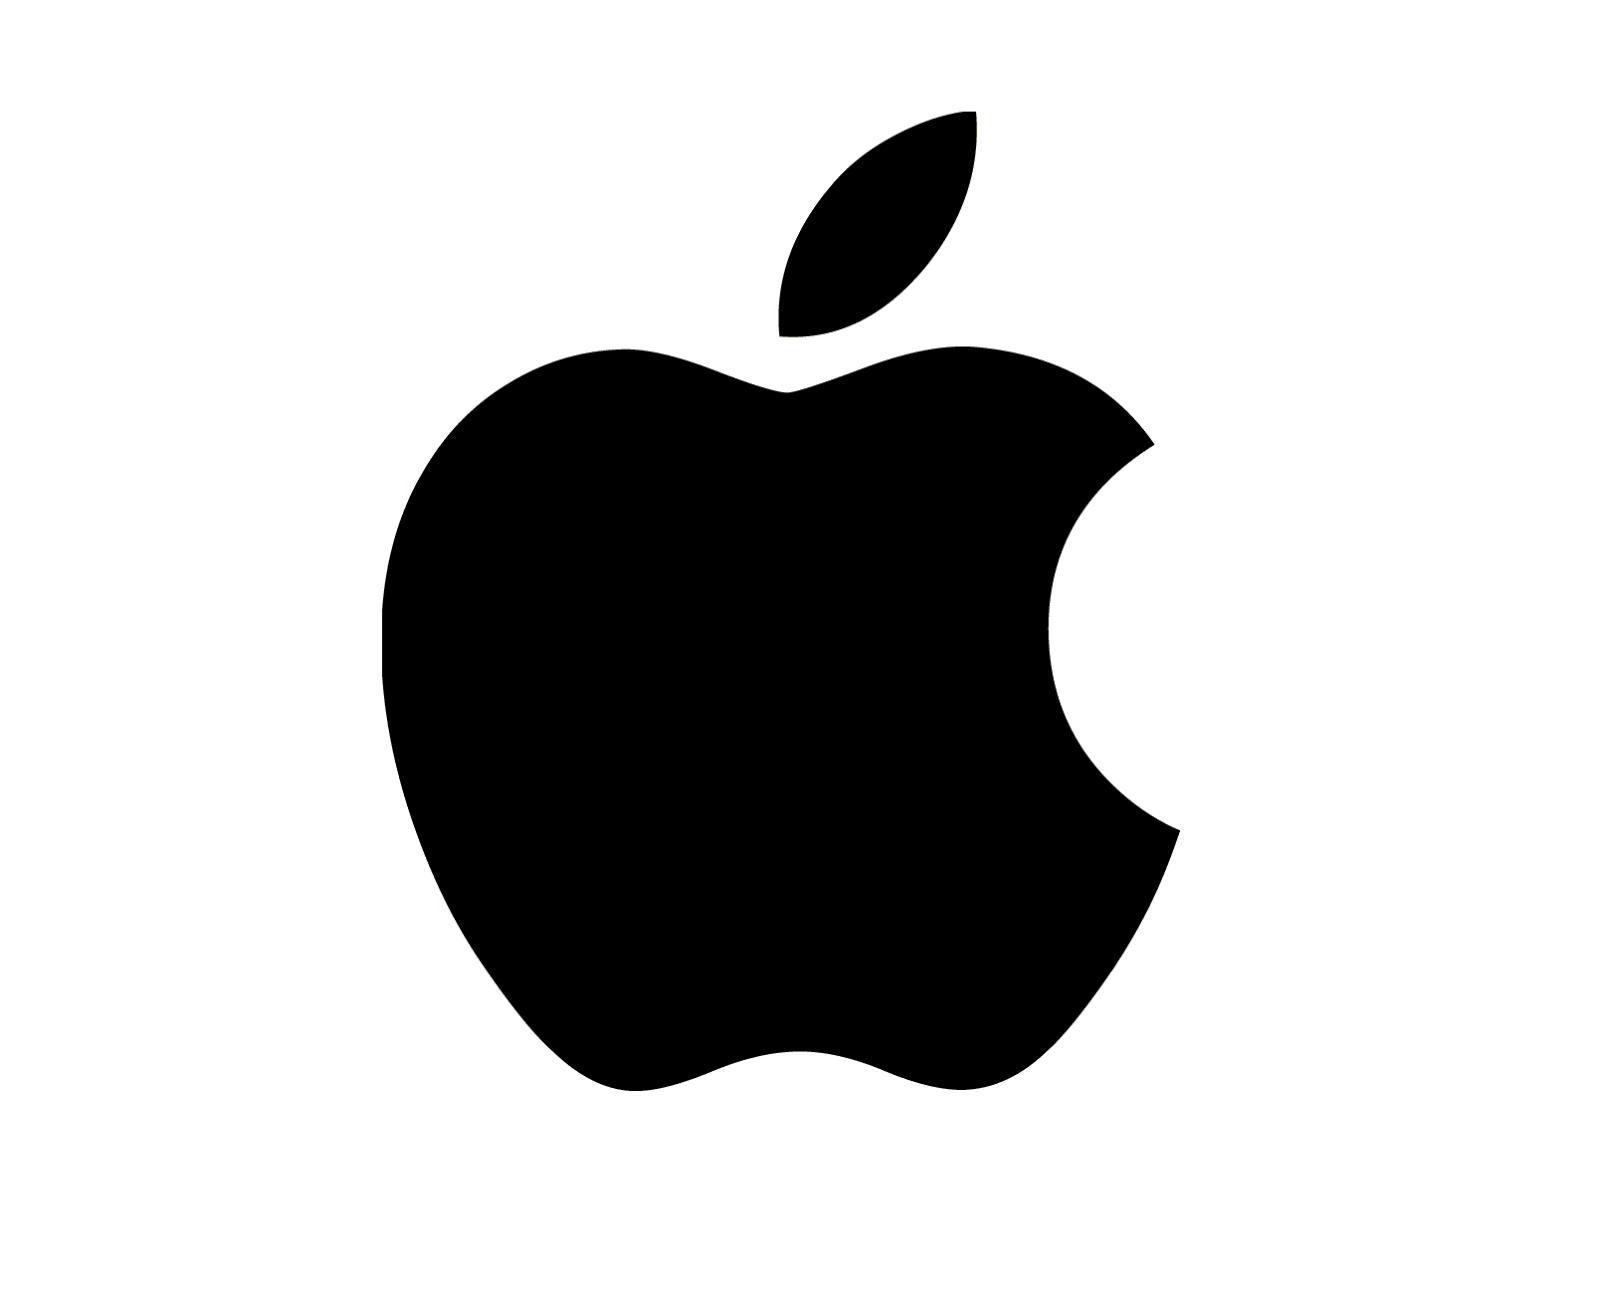 7. Apple